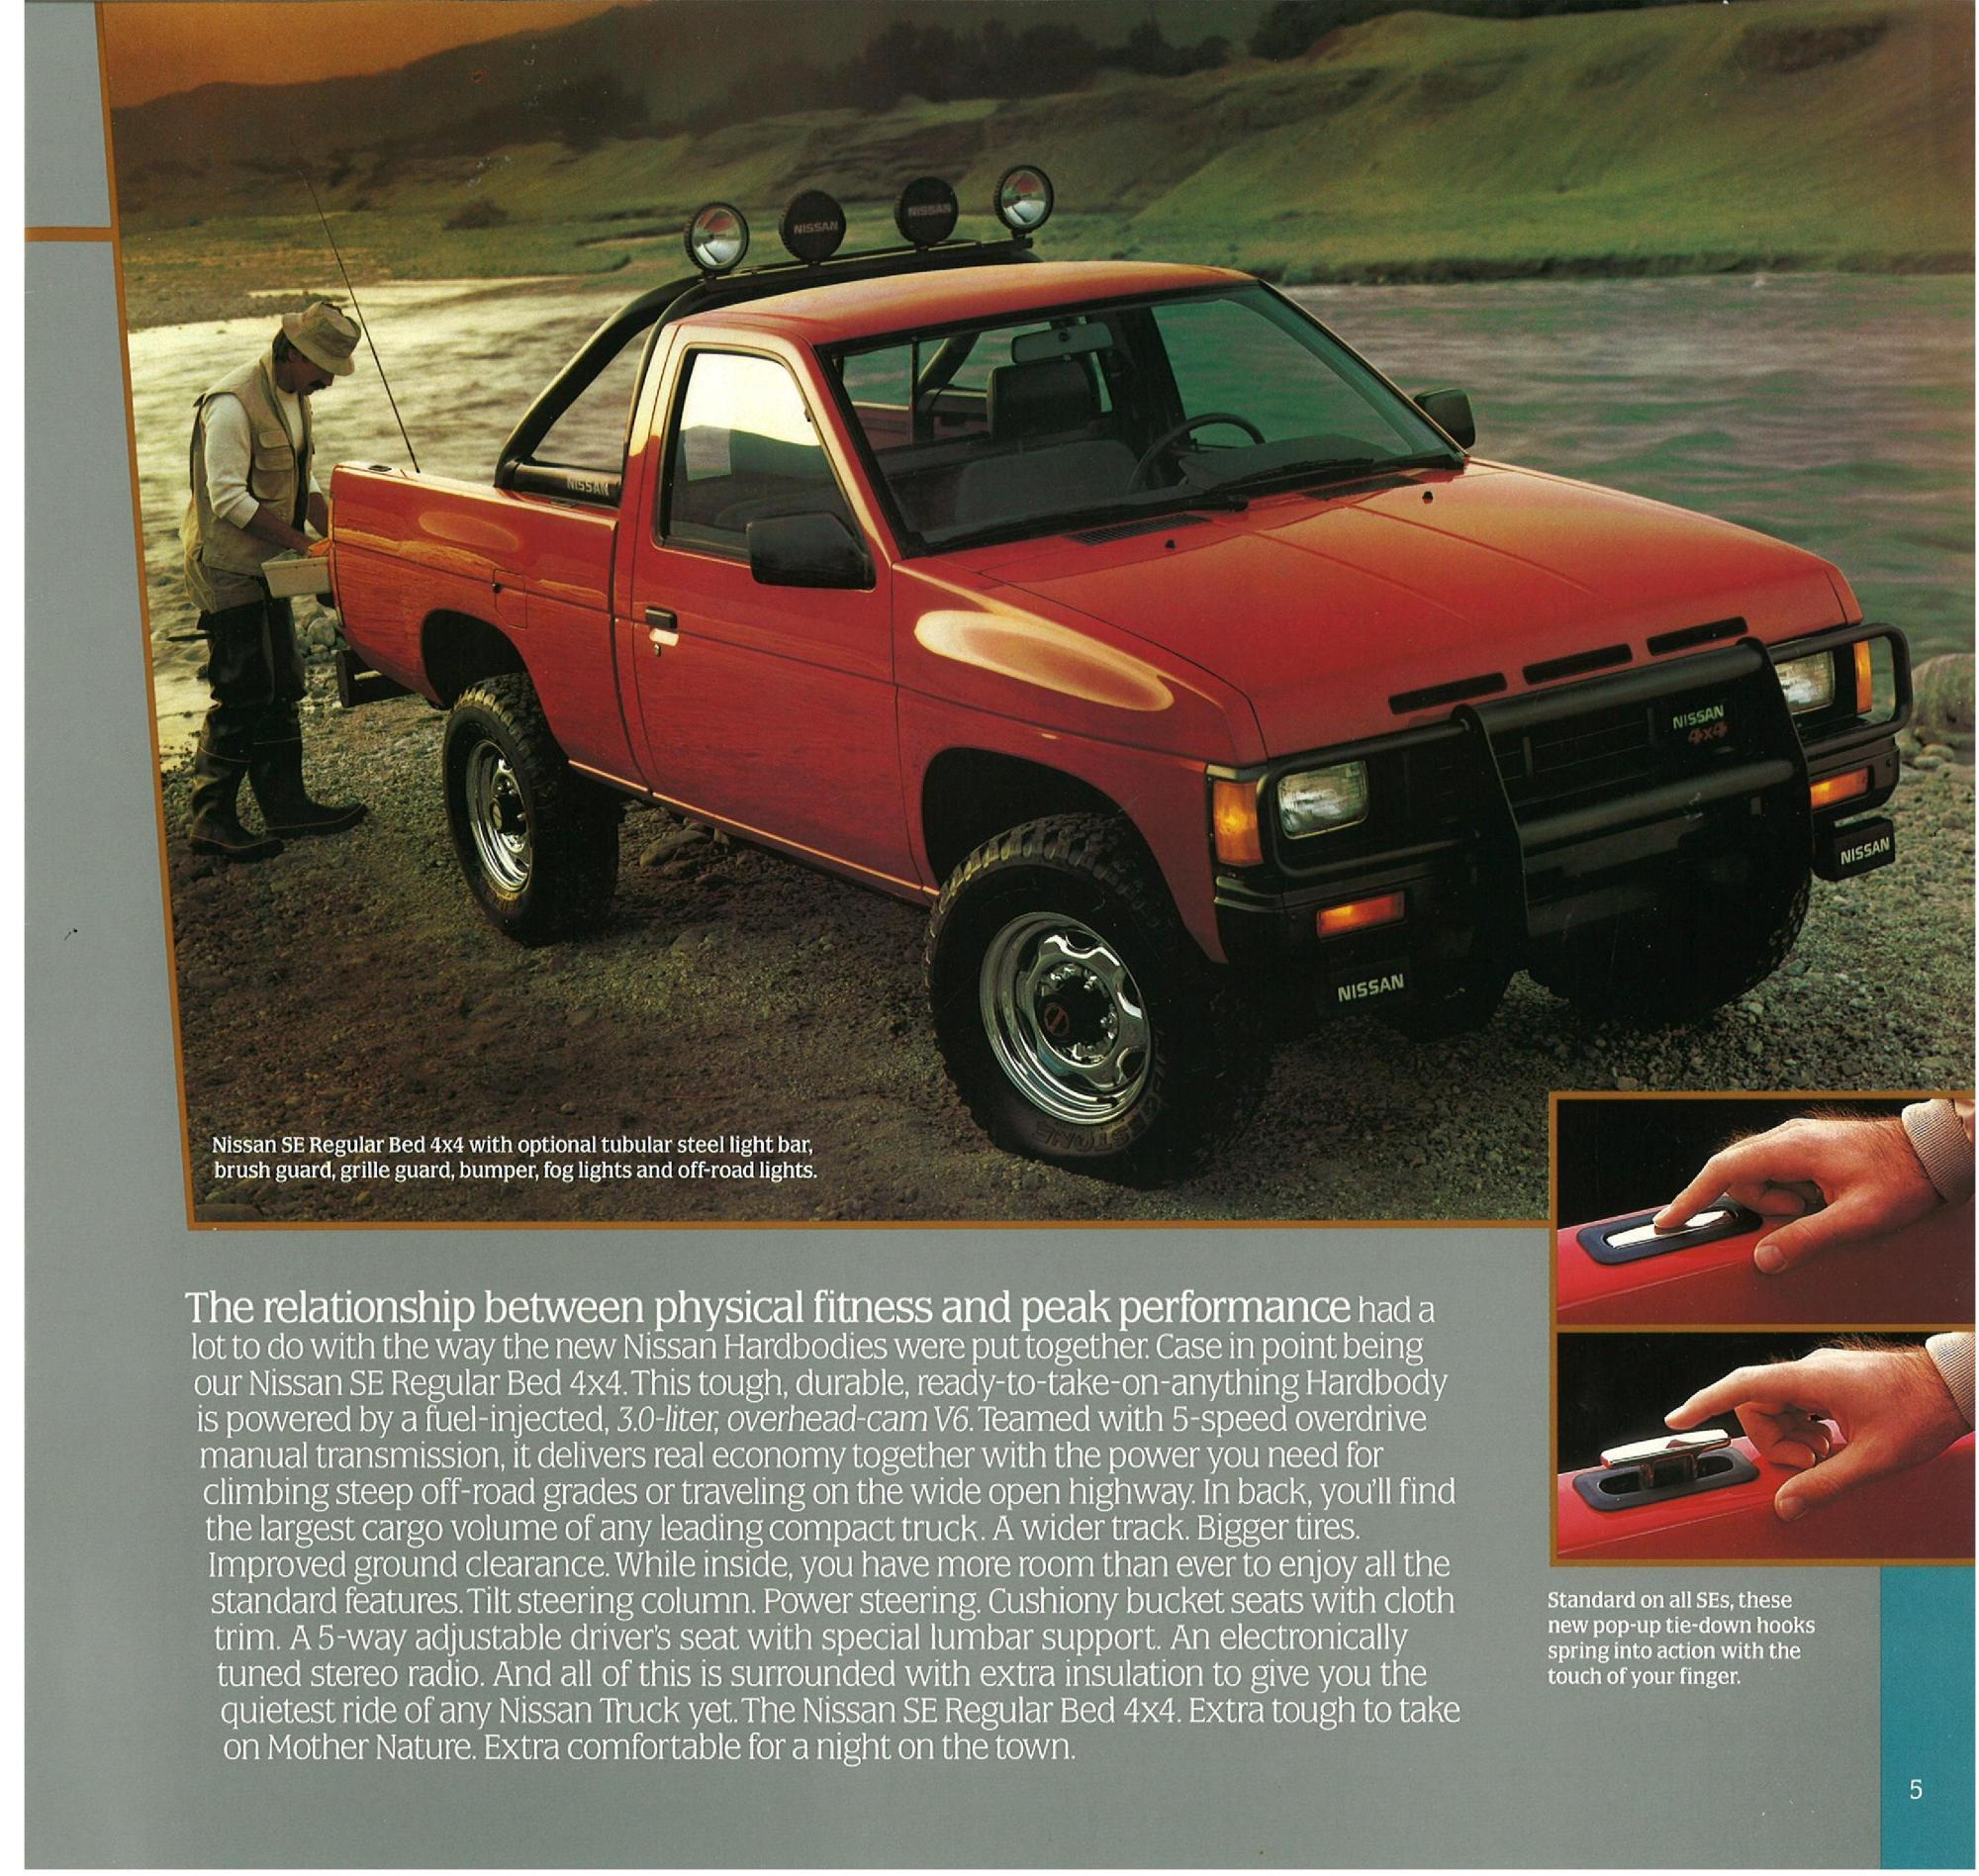 hight resolution of 1987 nissan truck d21 dealer brochure us market